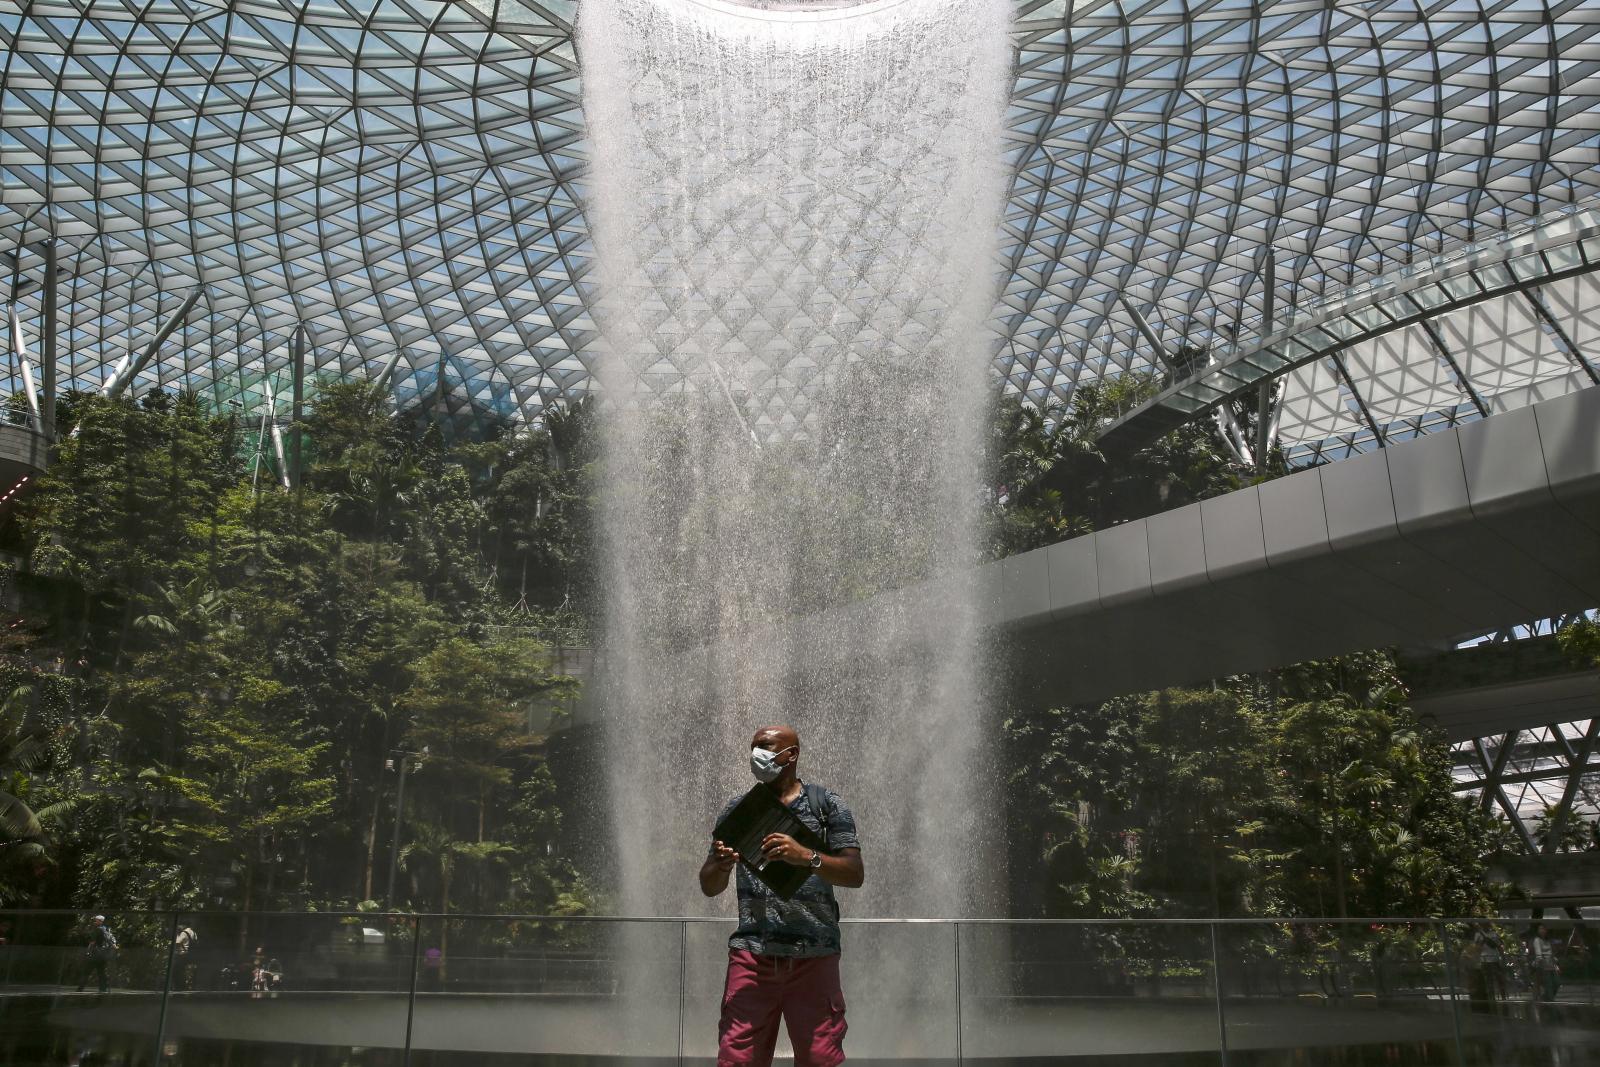 Singapur fot. EPA/WALLACE WOON